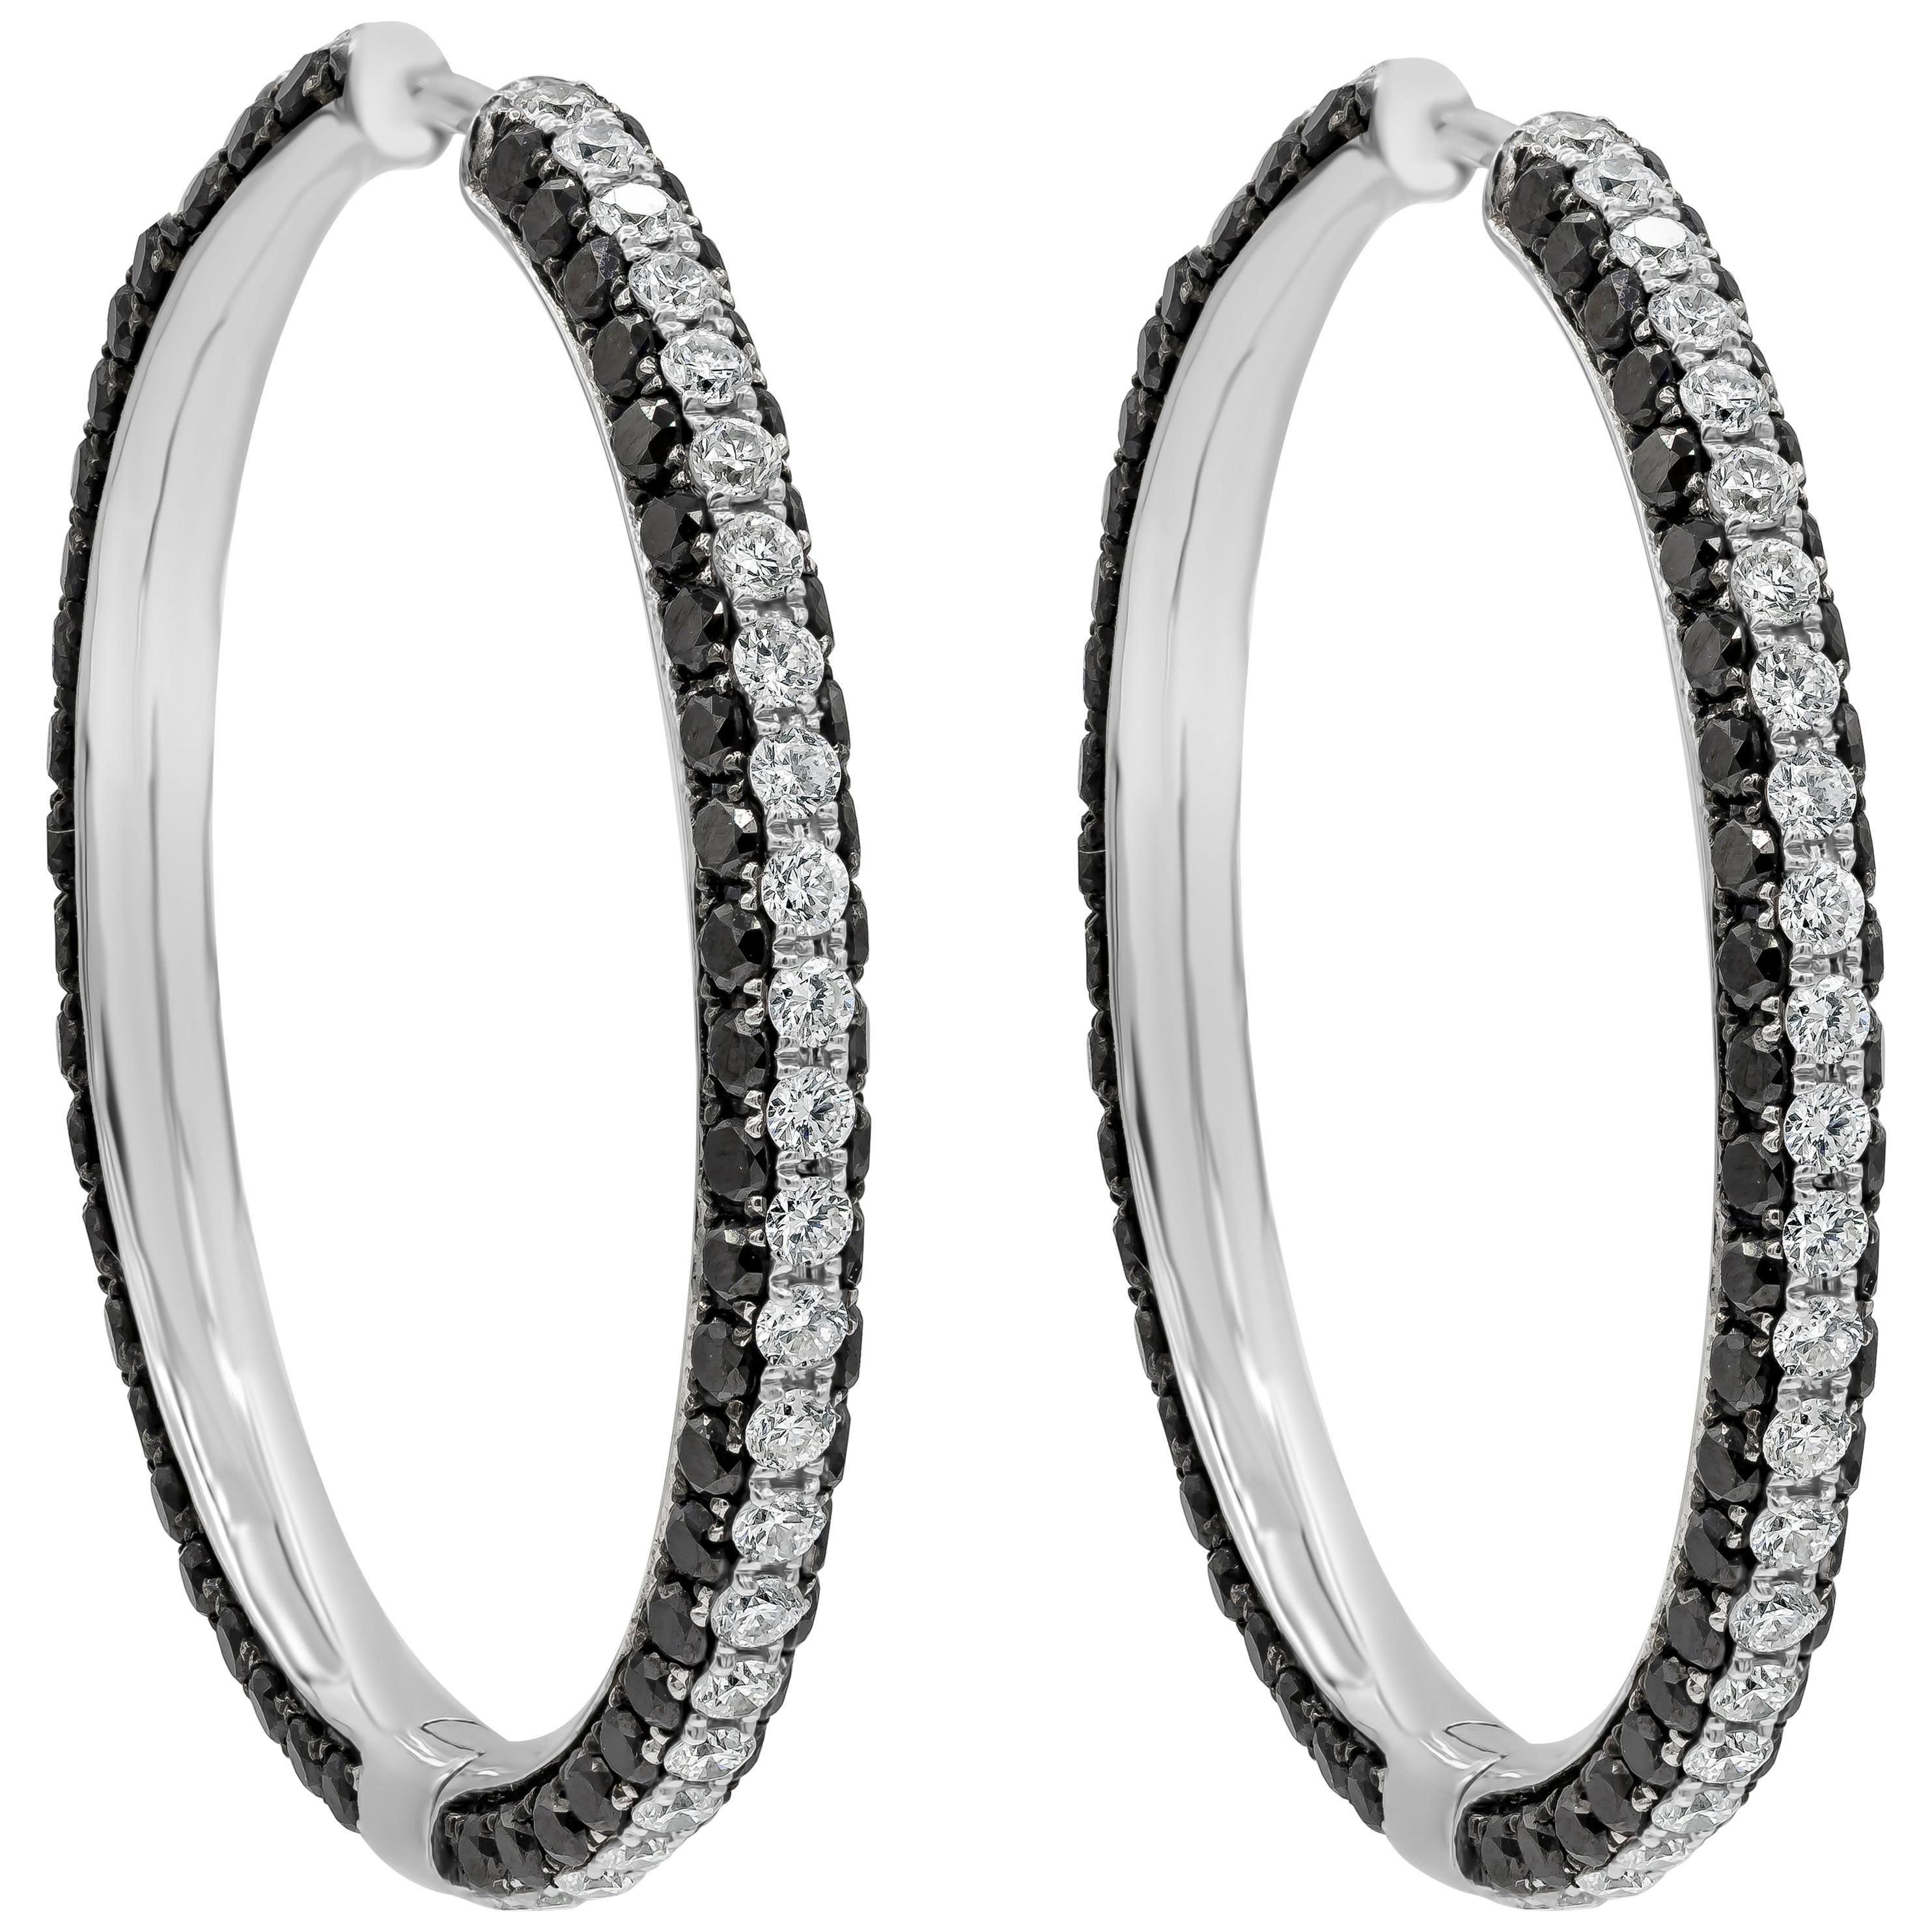 Black and White Diamond Micro-Pavé Hoop Earrings